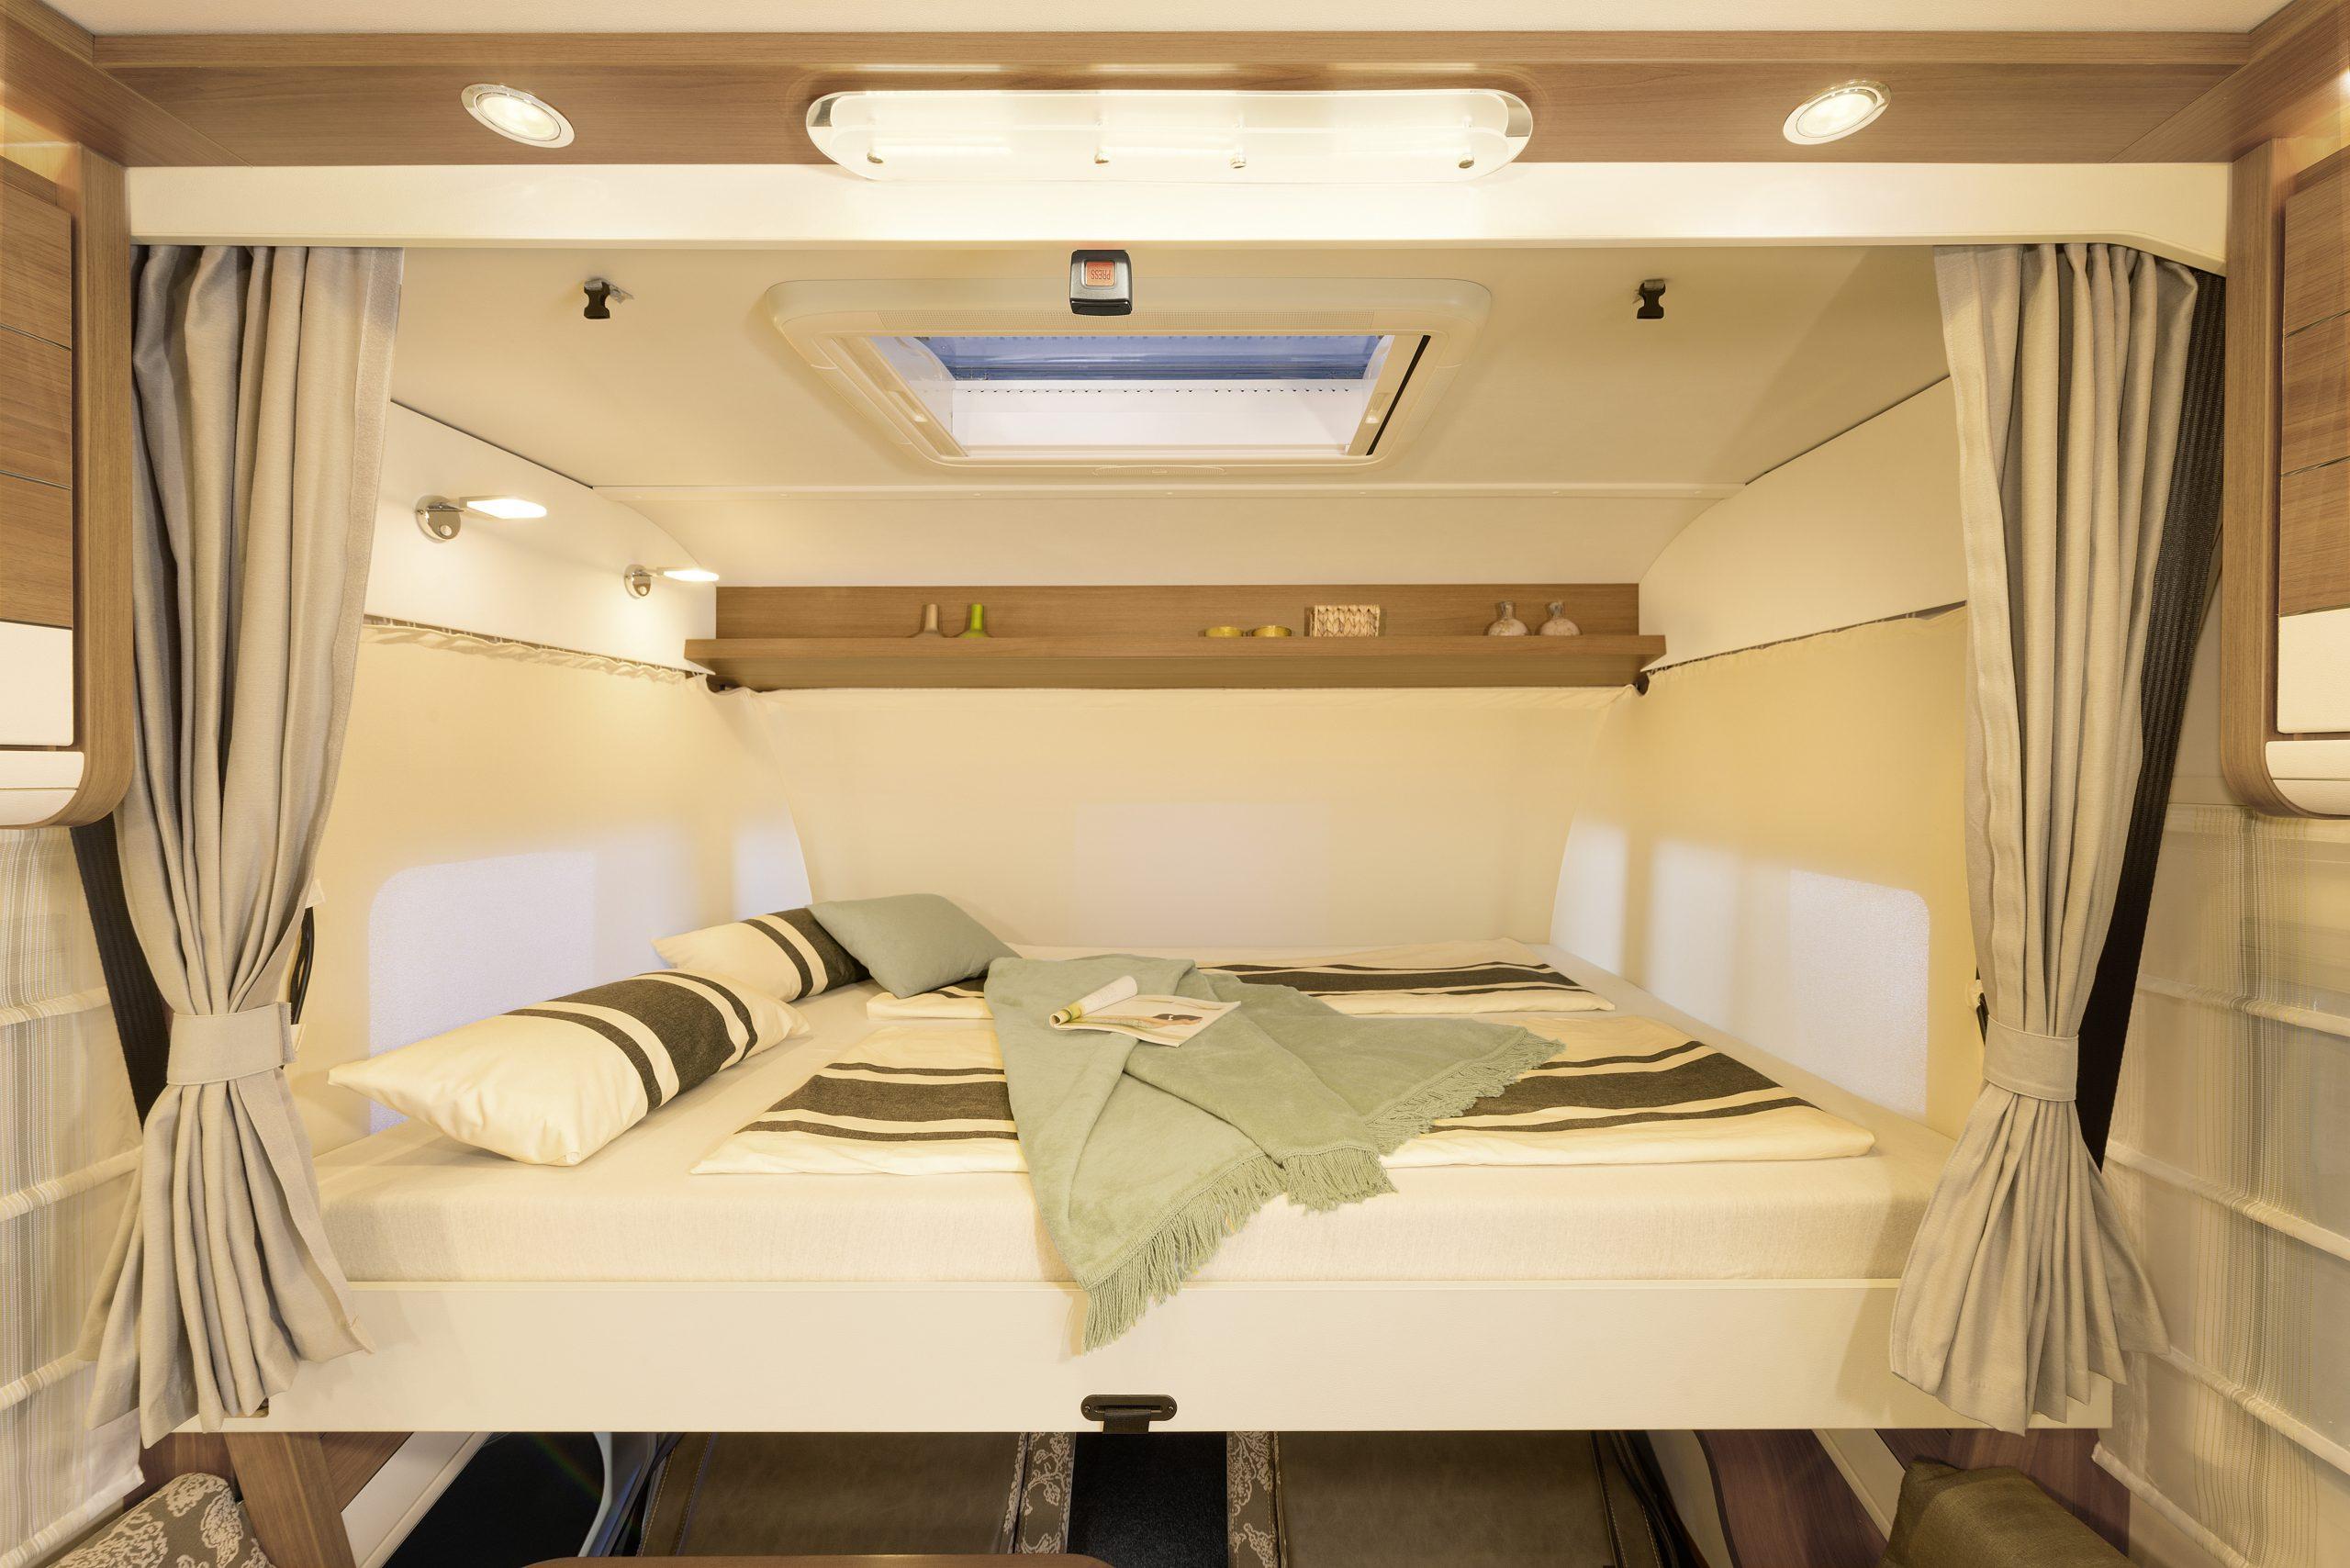 Premium Luxury seng der kan sænkes